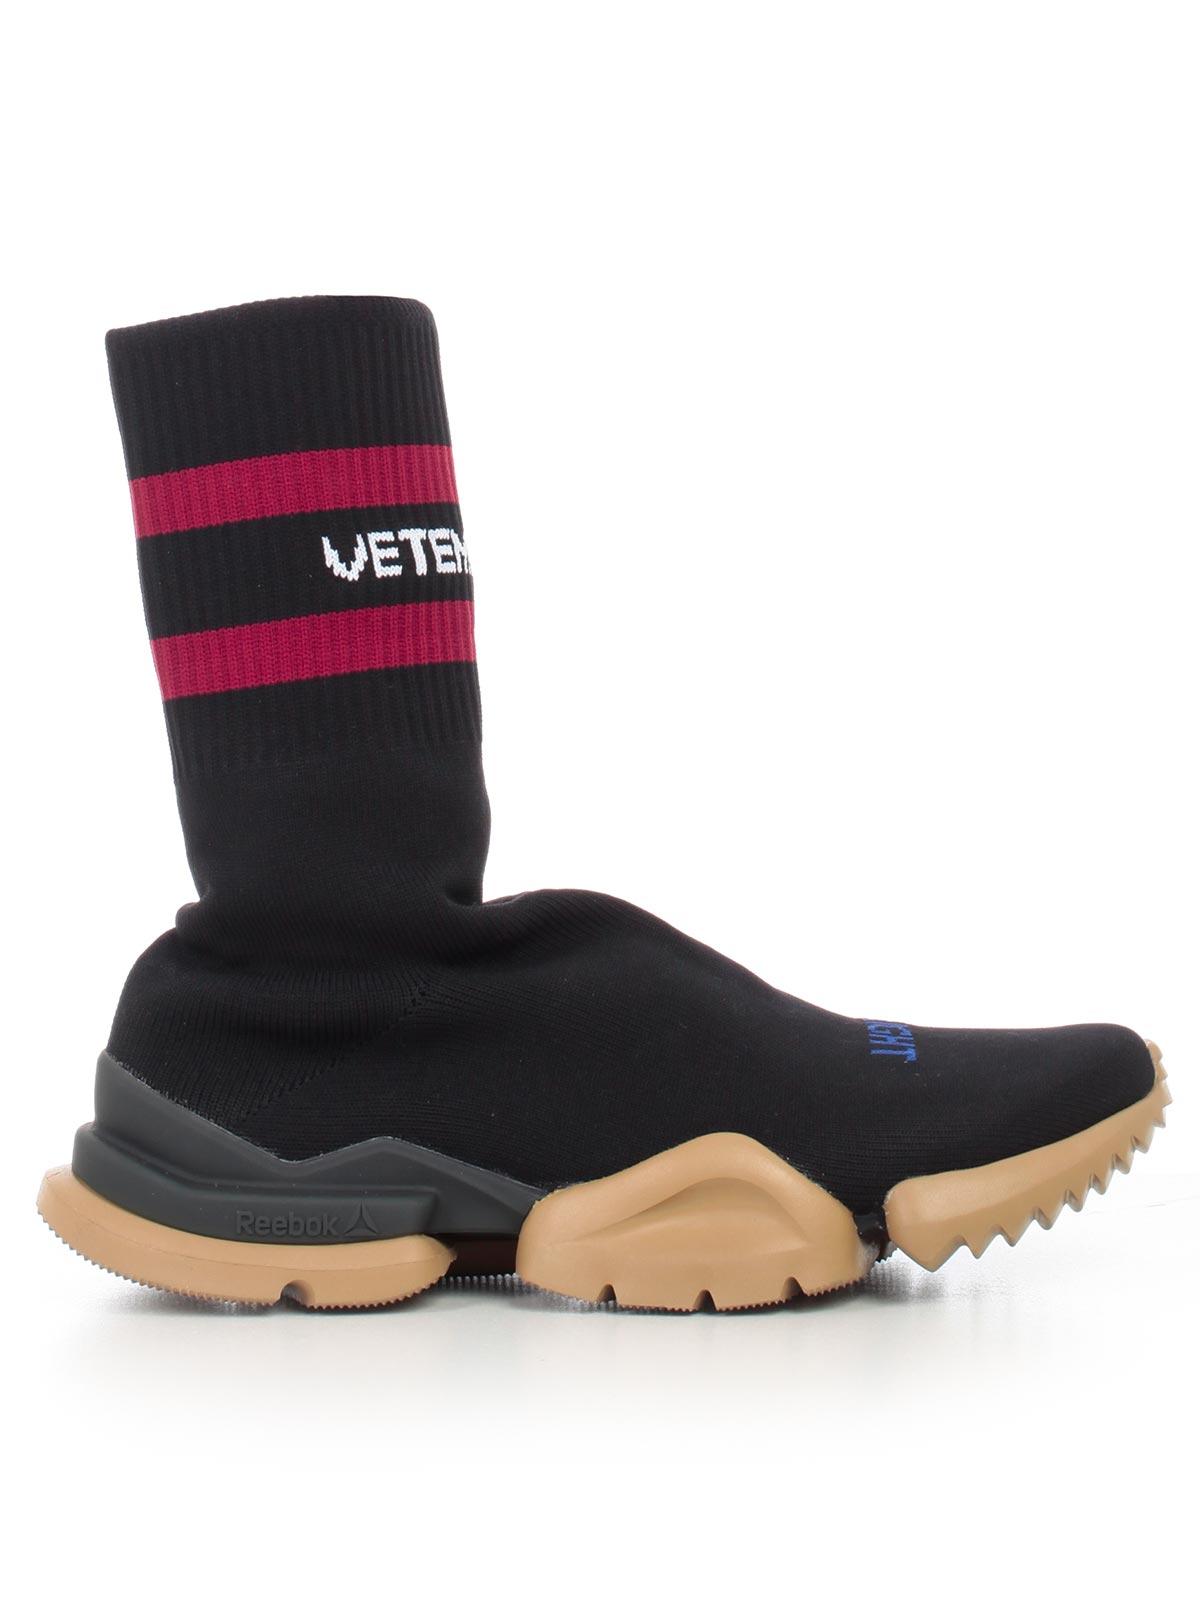 9883e125e99ba5 Vetements Shoes UAH19RE4 - BLACK.Bernardelli Store - Online fashion ...